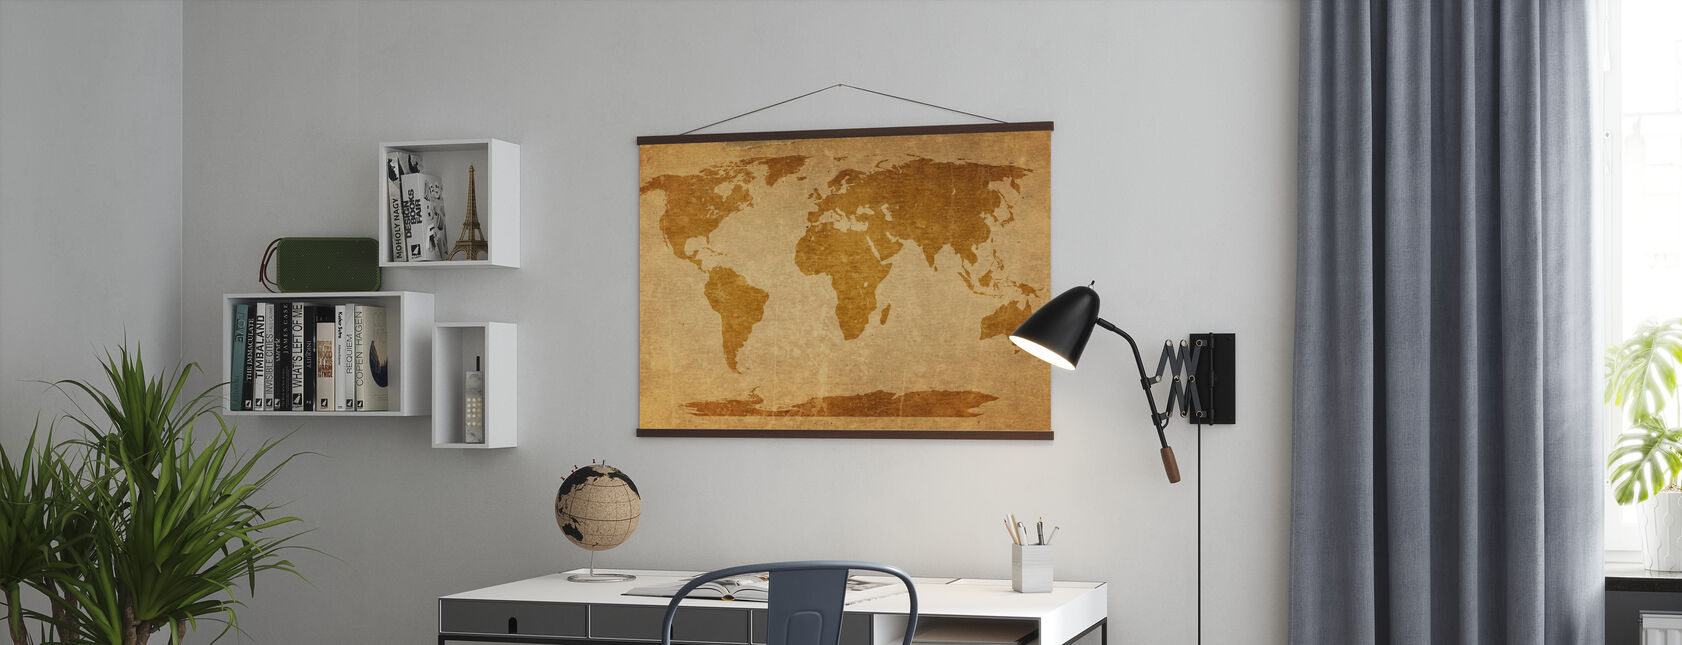 Sepia Wereld Kaart - Poster - Kantoor